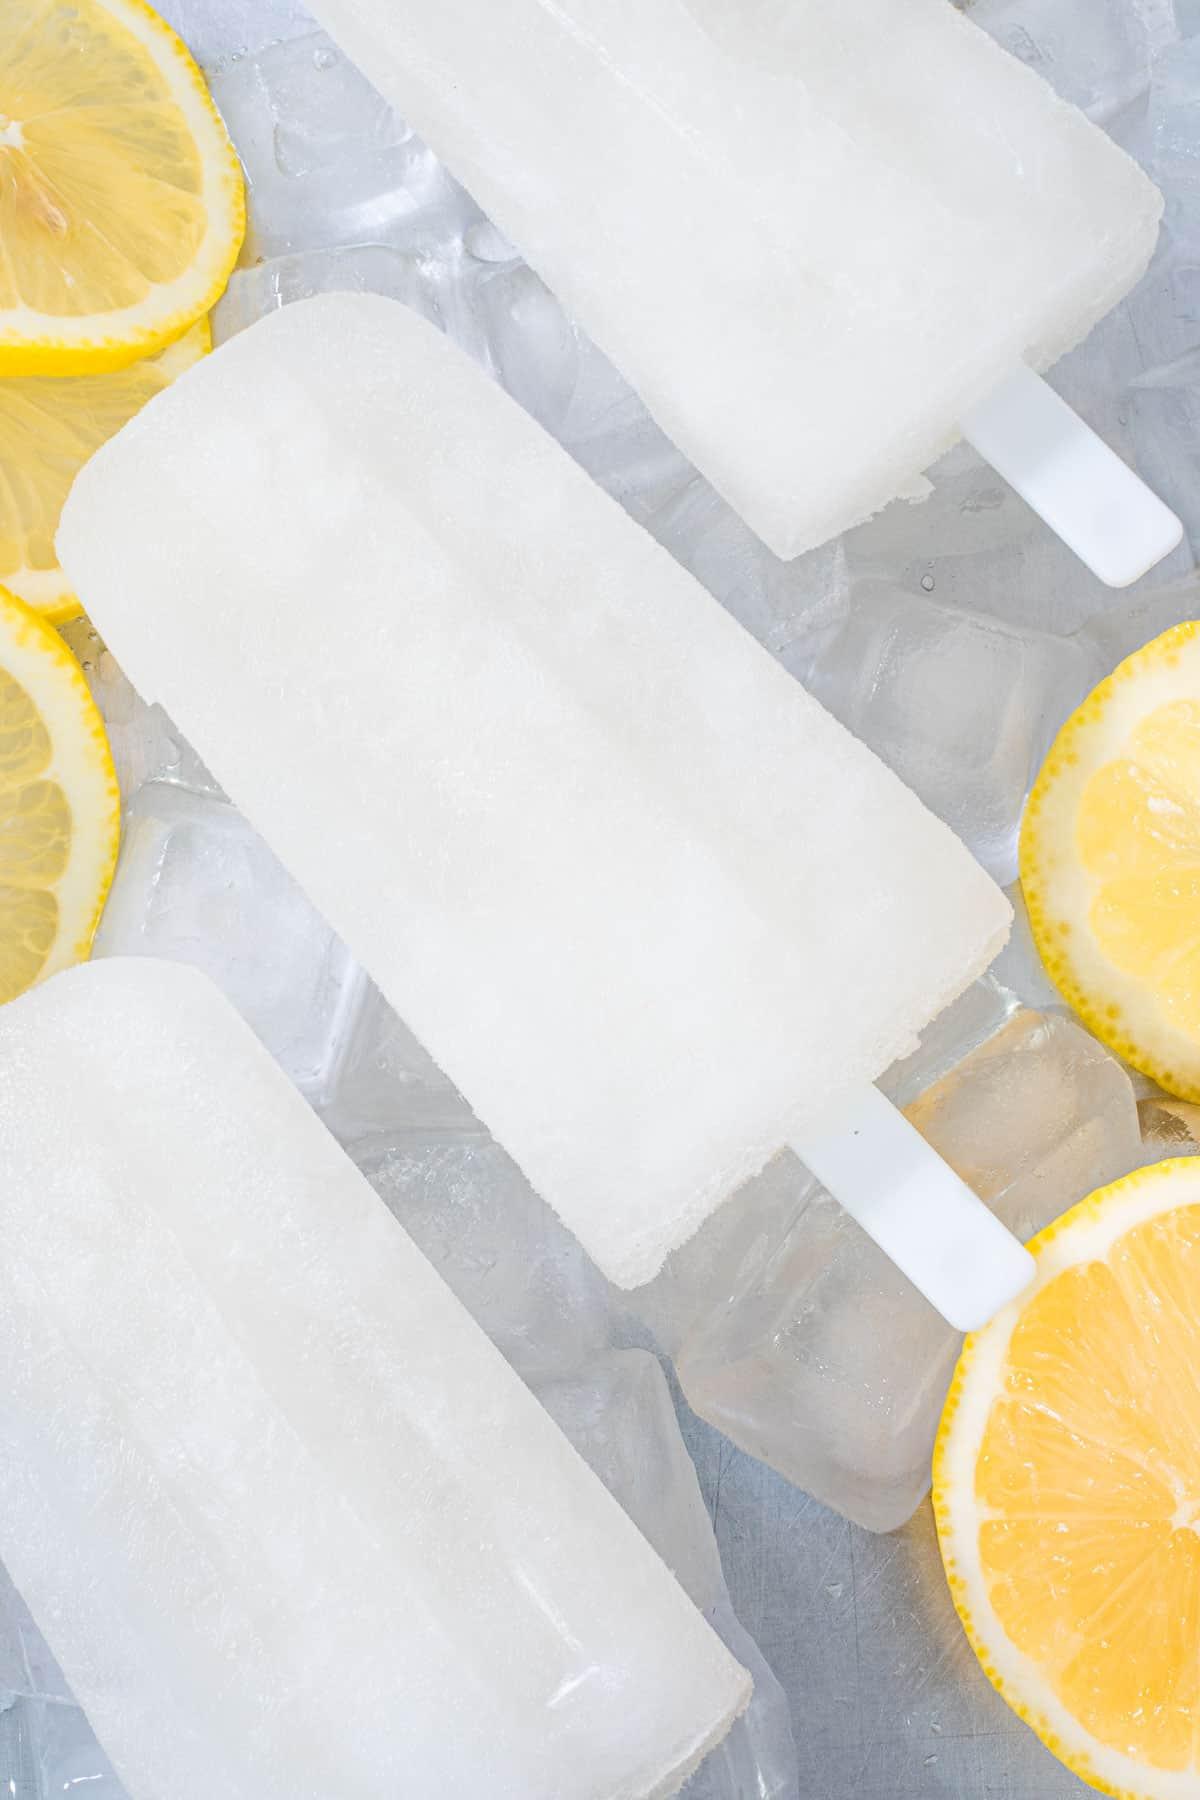 Close up of lemonade popsicles